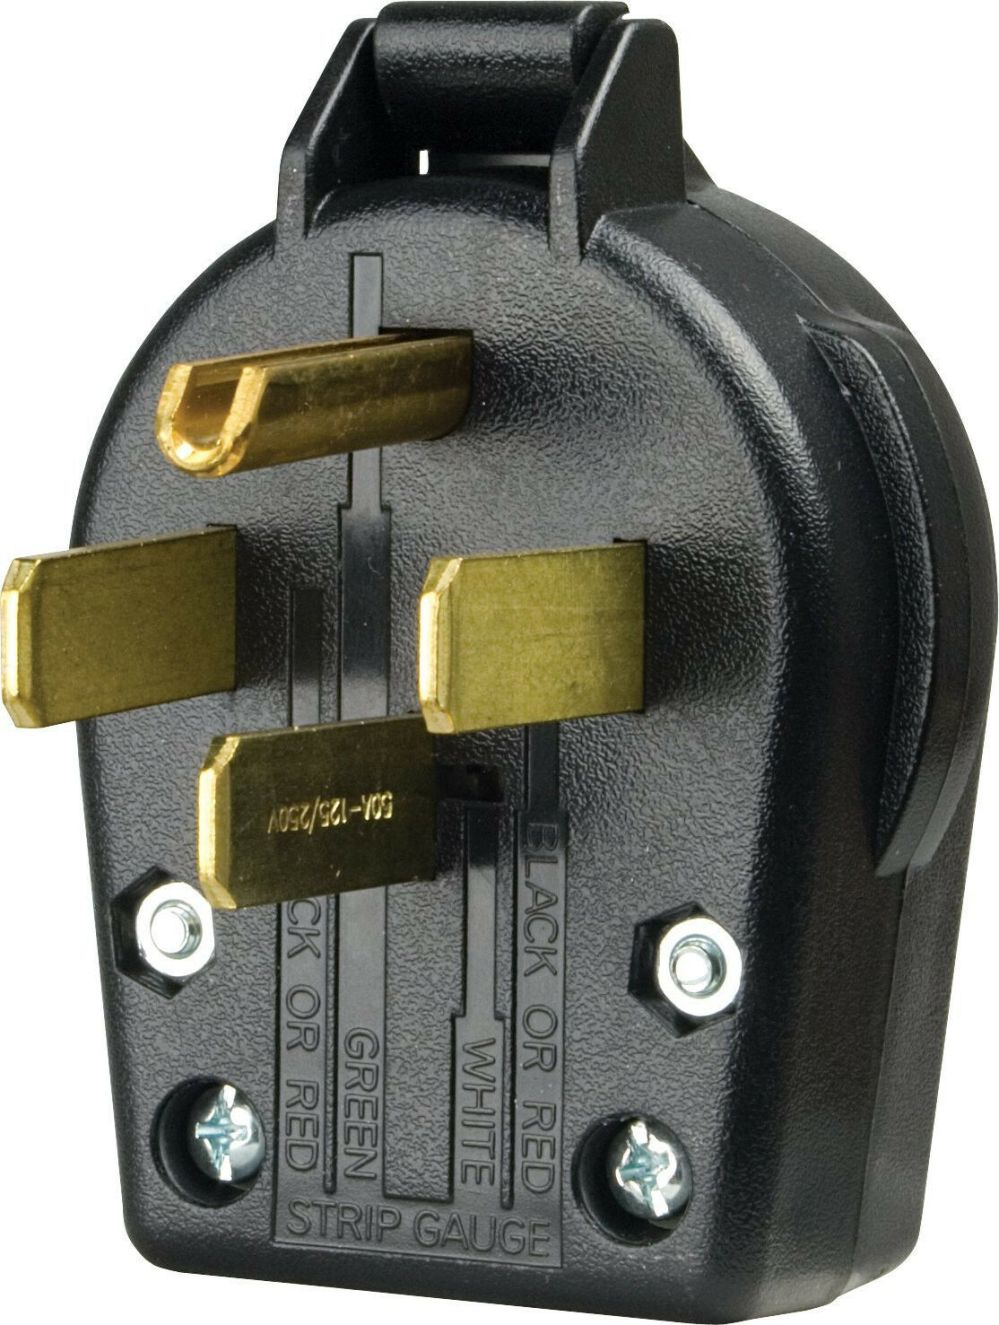 medium resolution of cooper wiring devices s 21 sp l dryer angles plug 30 amp 125 250 volt black for sale online ebay